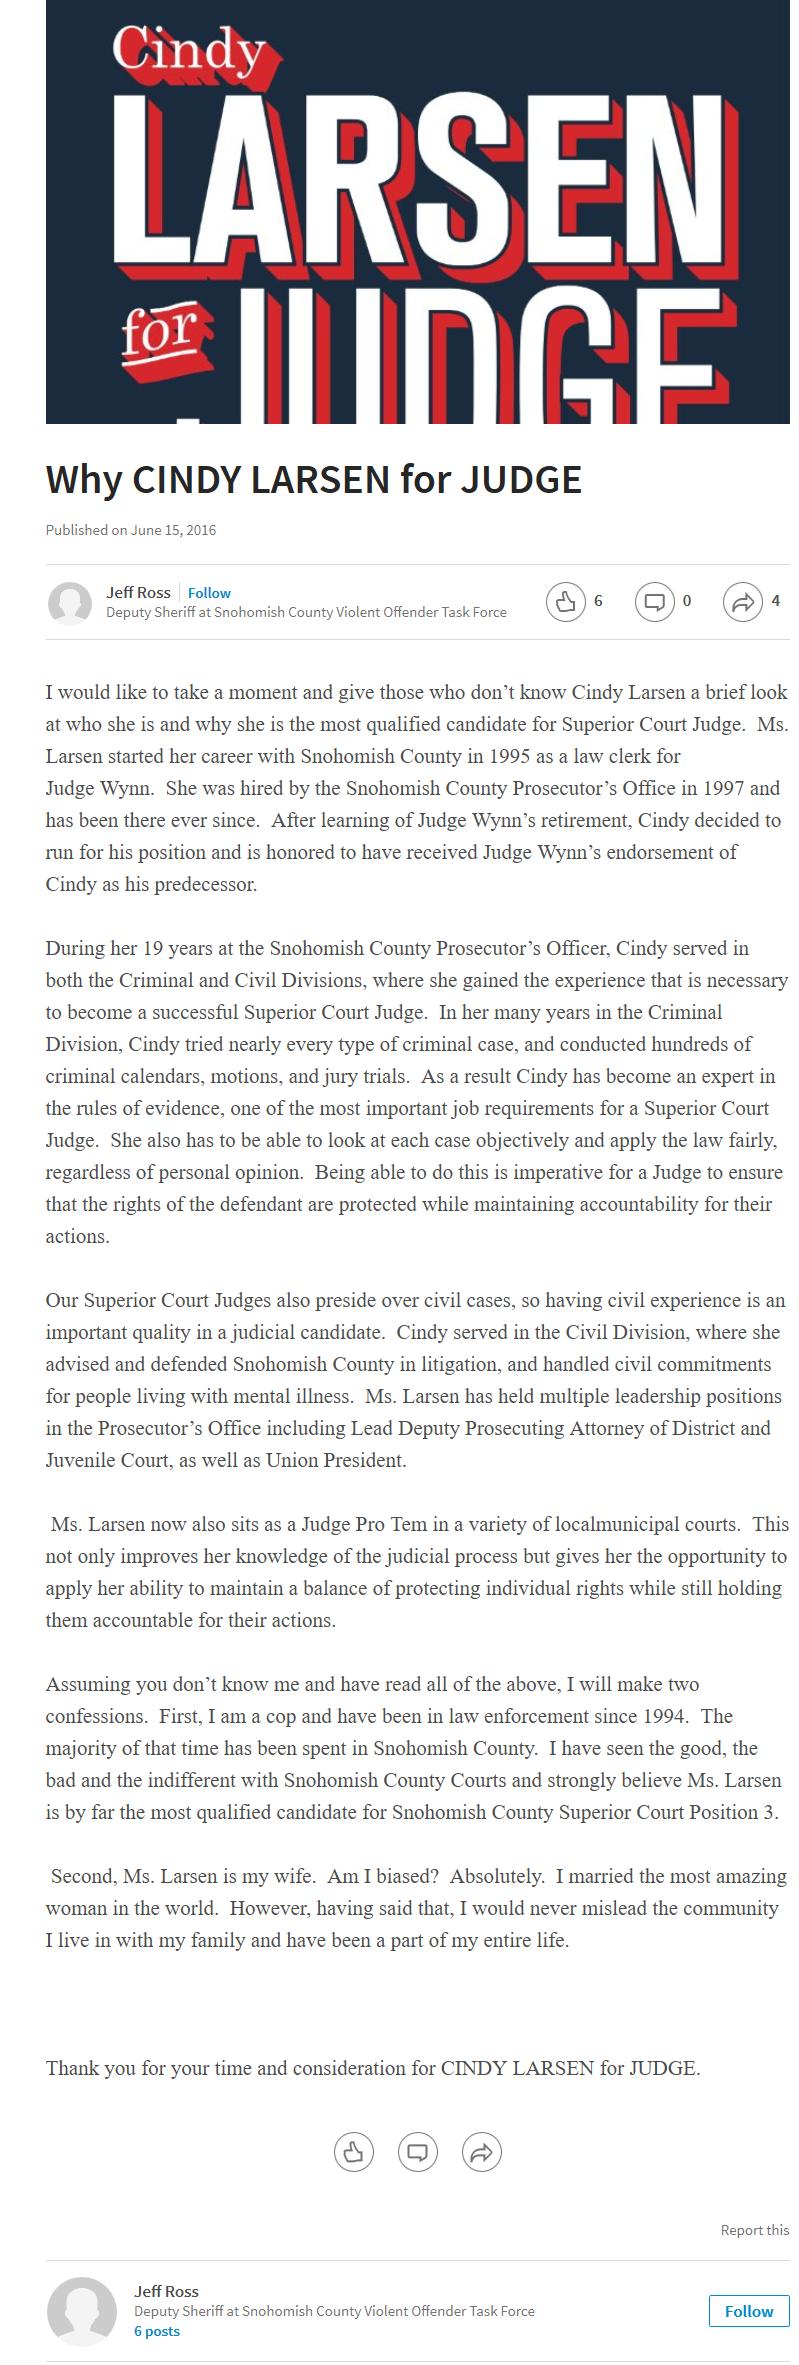 Why CINDY LARSEN for JUDGE - Jeff Ross - Pulse - LinkedIn 2016-09-04 01-33-04